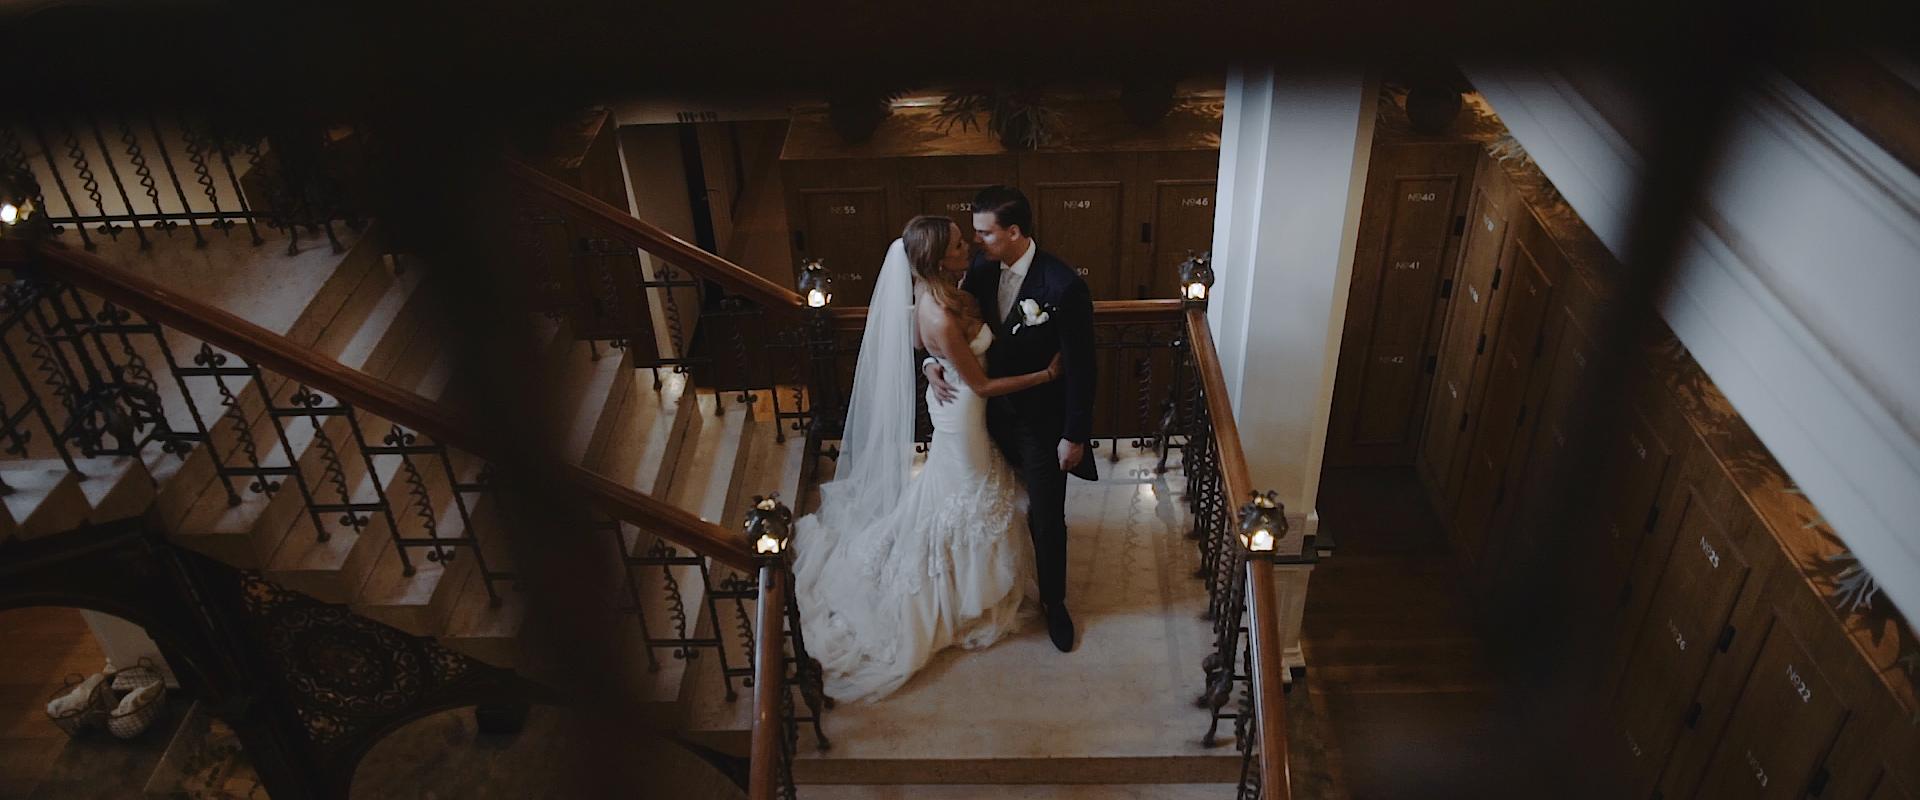 Classic romantic wedding at Hotel Arena / Julia & Max